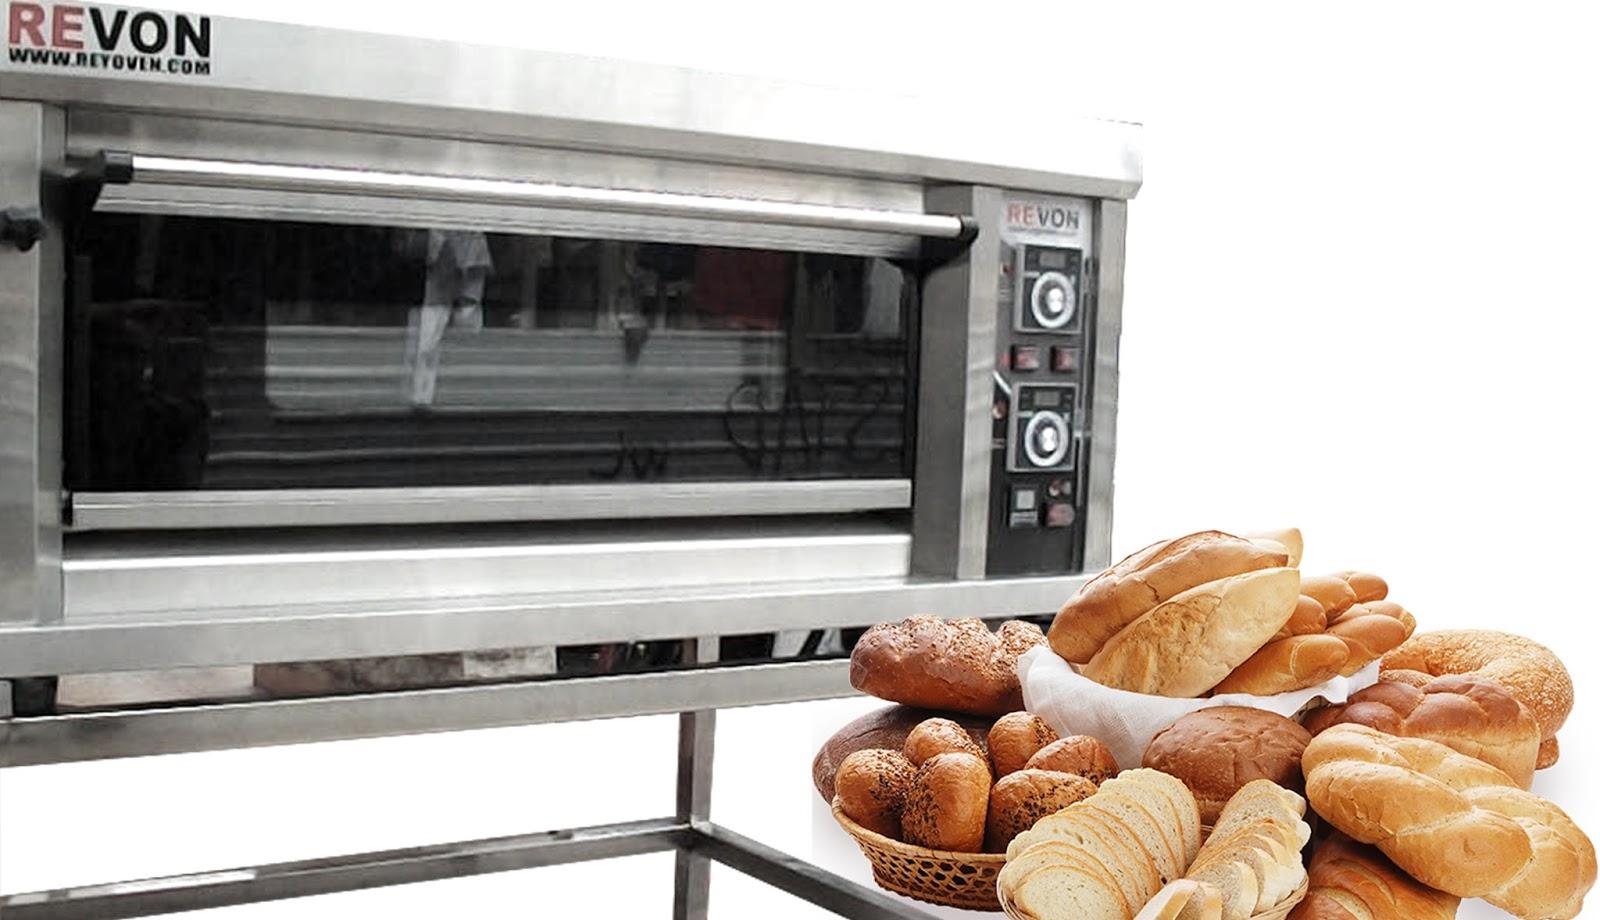 Cara kerja oven gas otomatis untuk industri bakery oven gas no1 cara kerja oven gas otomatis untuk industri bakery ccuart Gallery